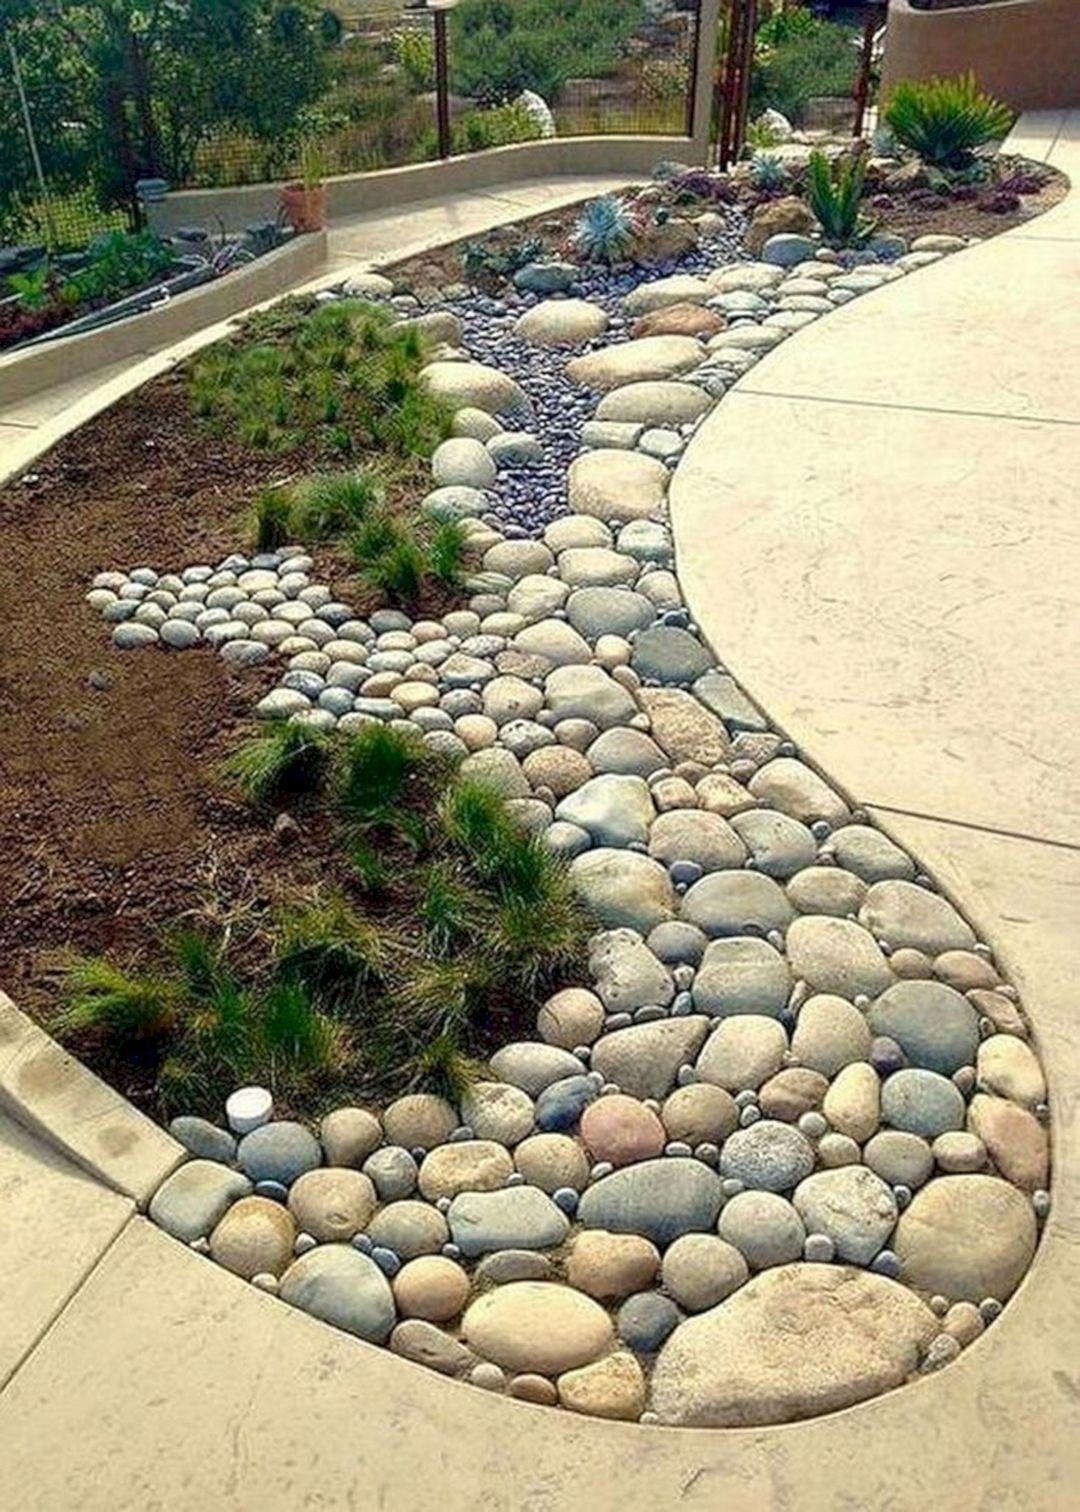 Wonderful Backyard Design With Gravel Stone Ideas Teracee Front Yard Landscaping Design Backyard Garden Landscape Rock Garden Landscaping